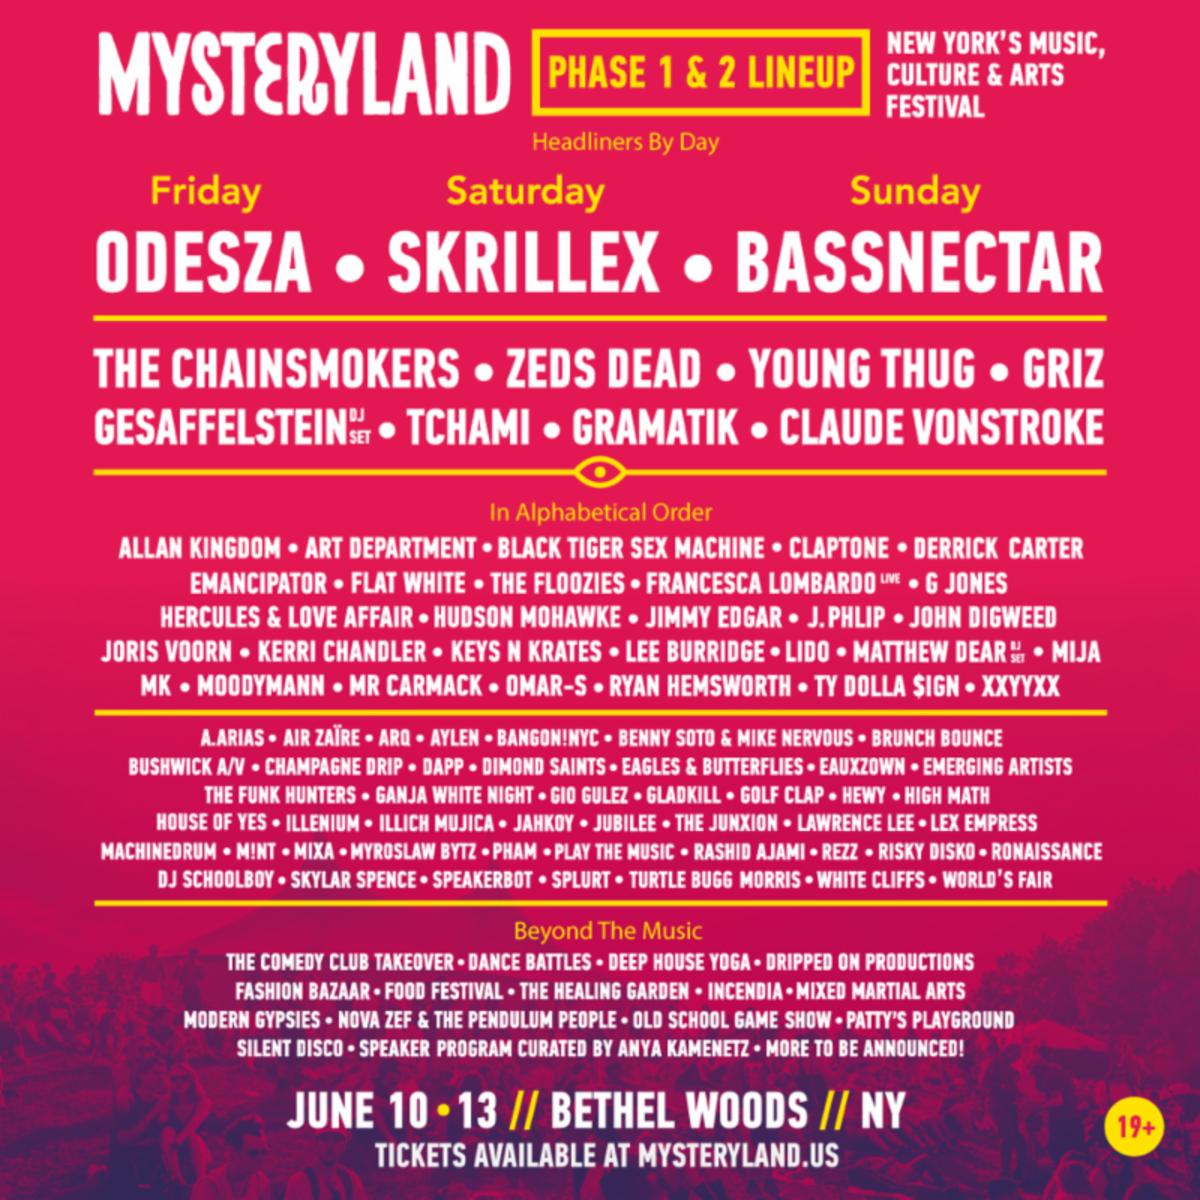 Mysteryland 2016 lineup